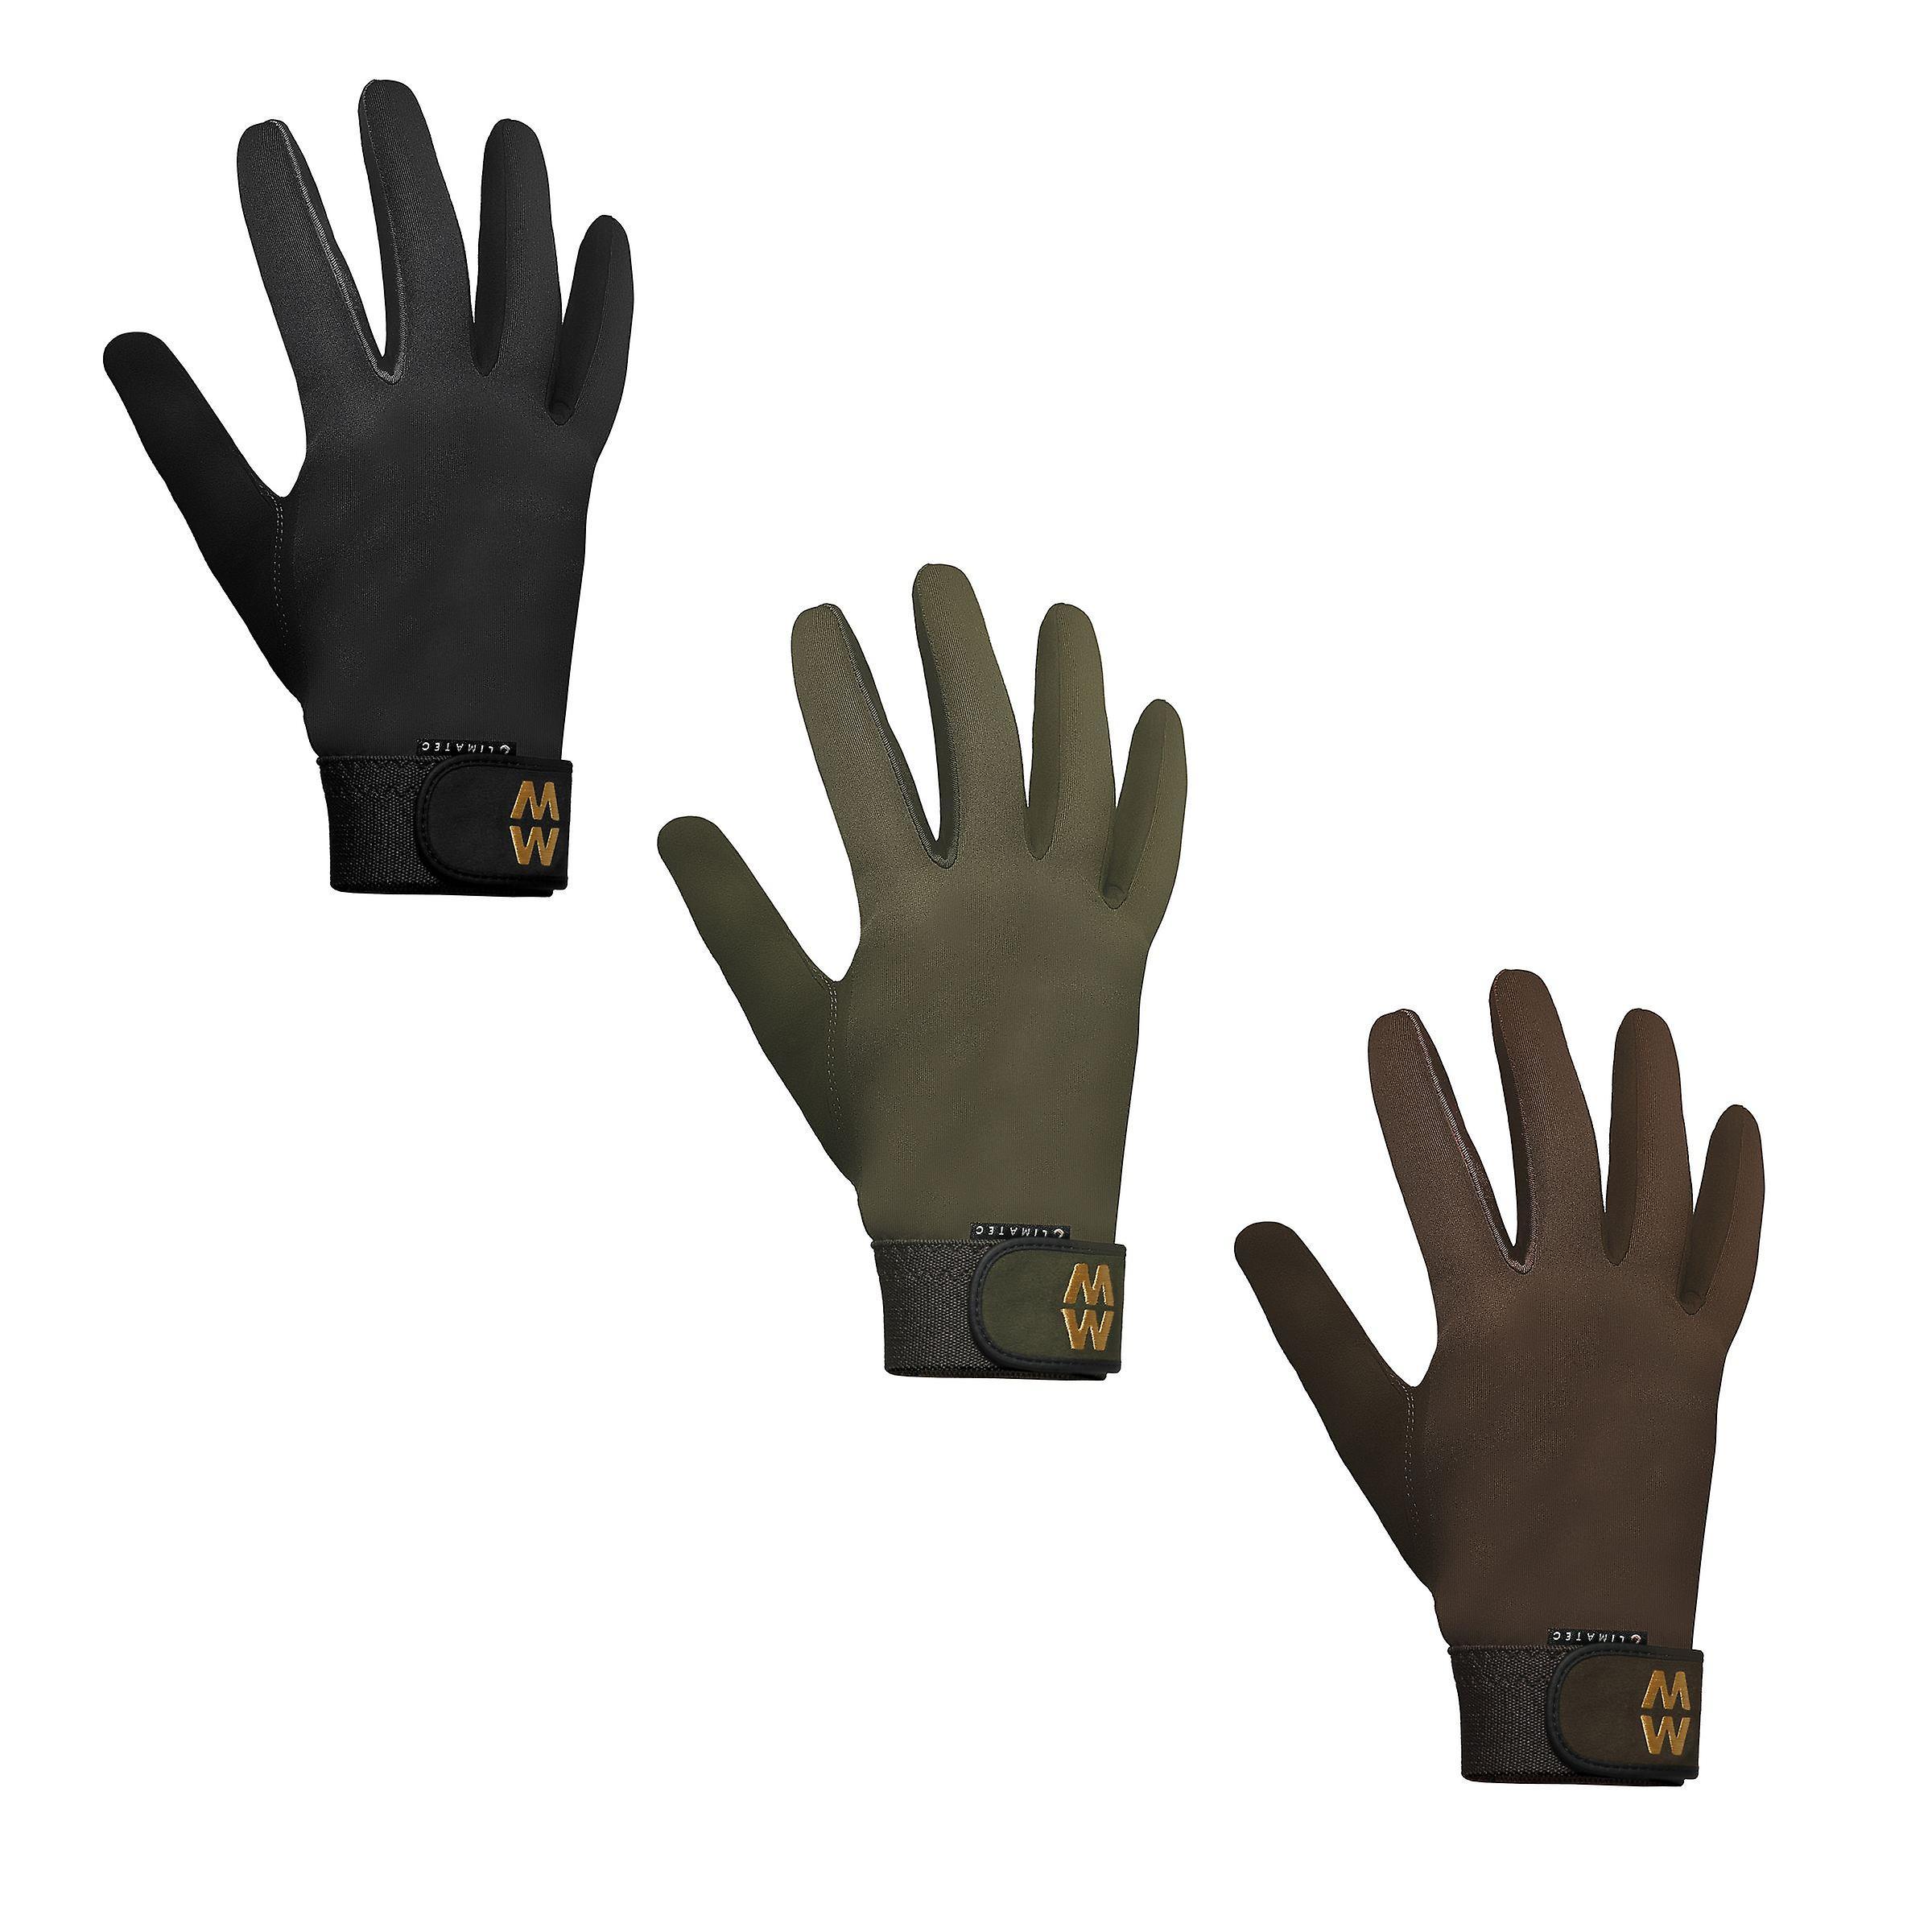 Macwet Handschuhe Climatec lange Manschette - Grip bei allen Bedingungen Golf Bogenschießen